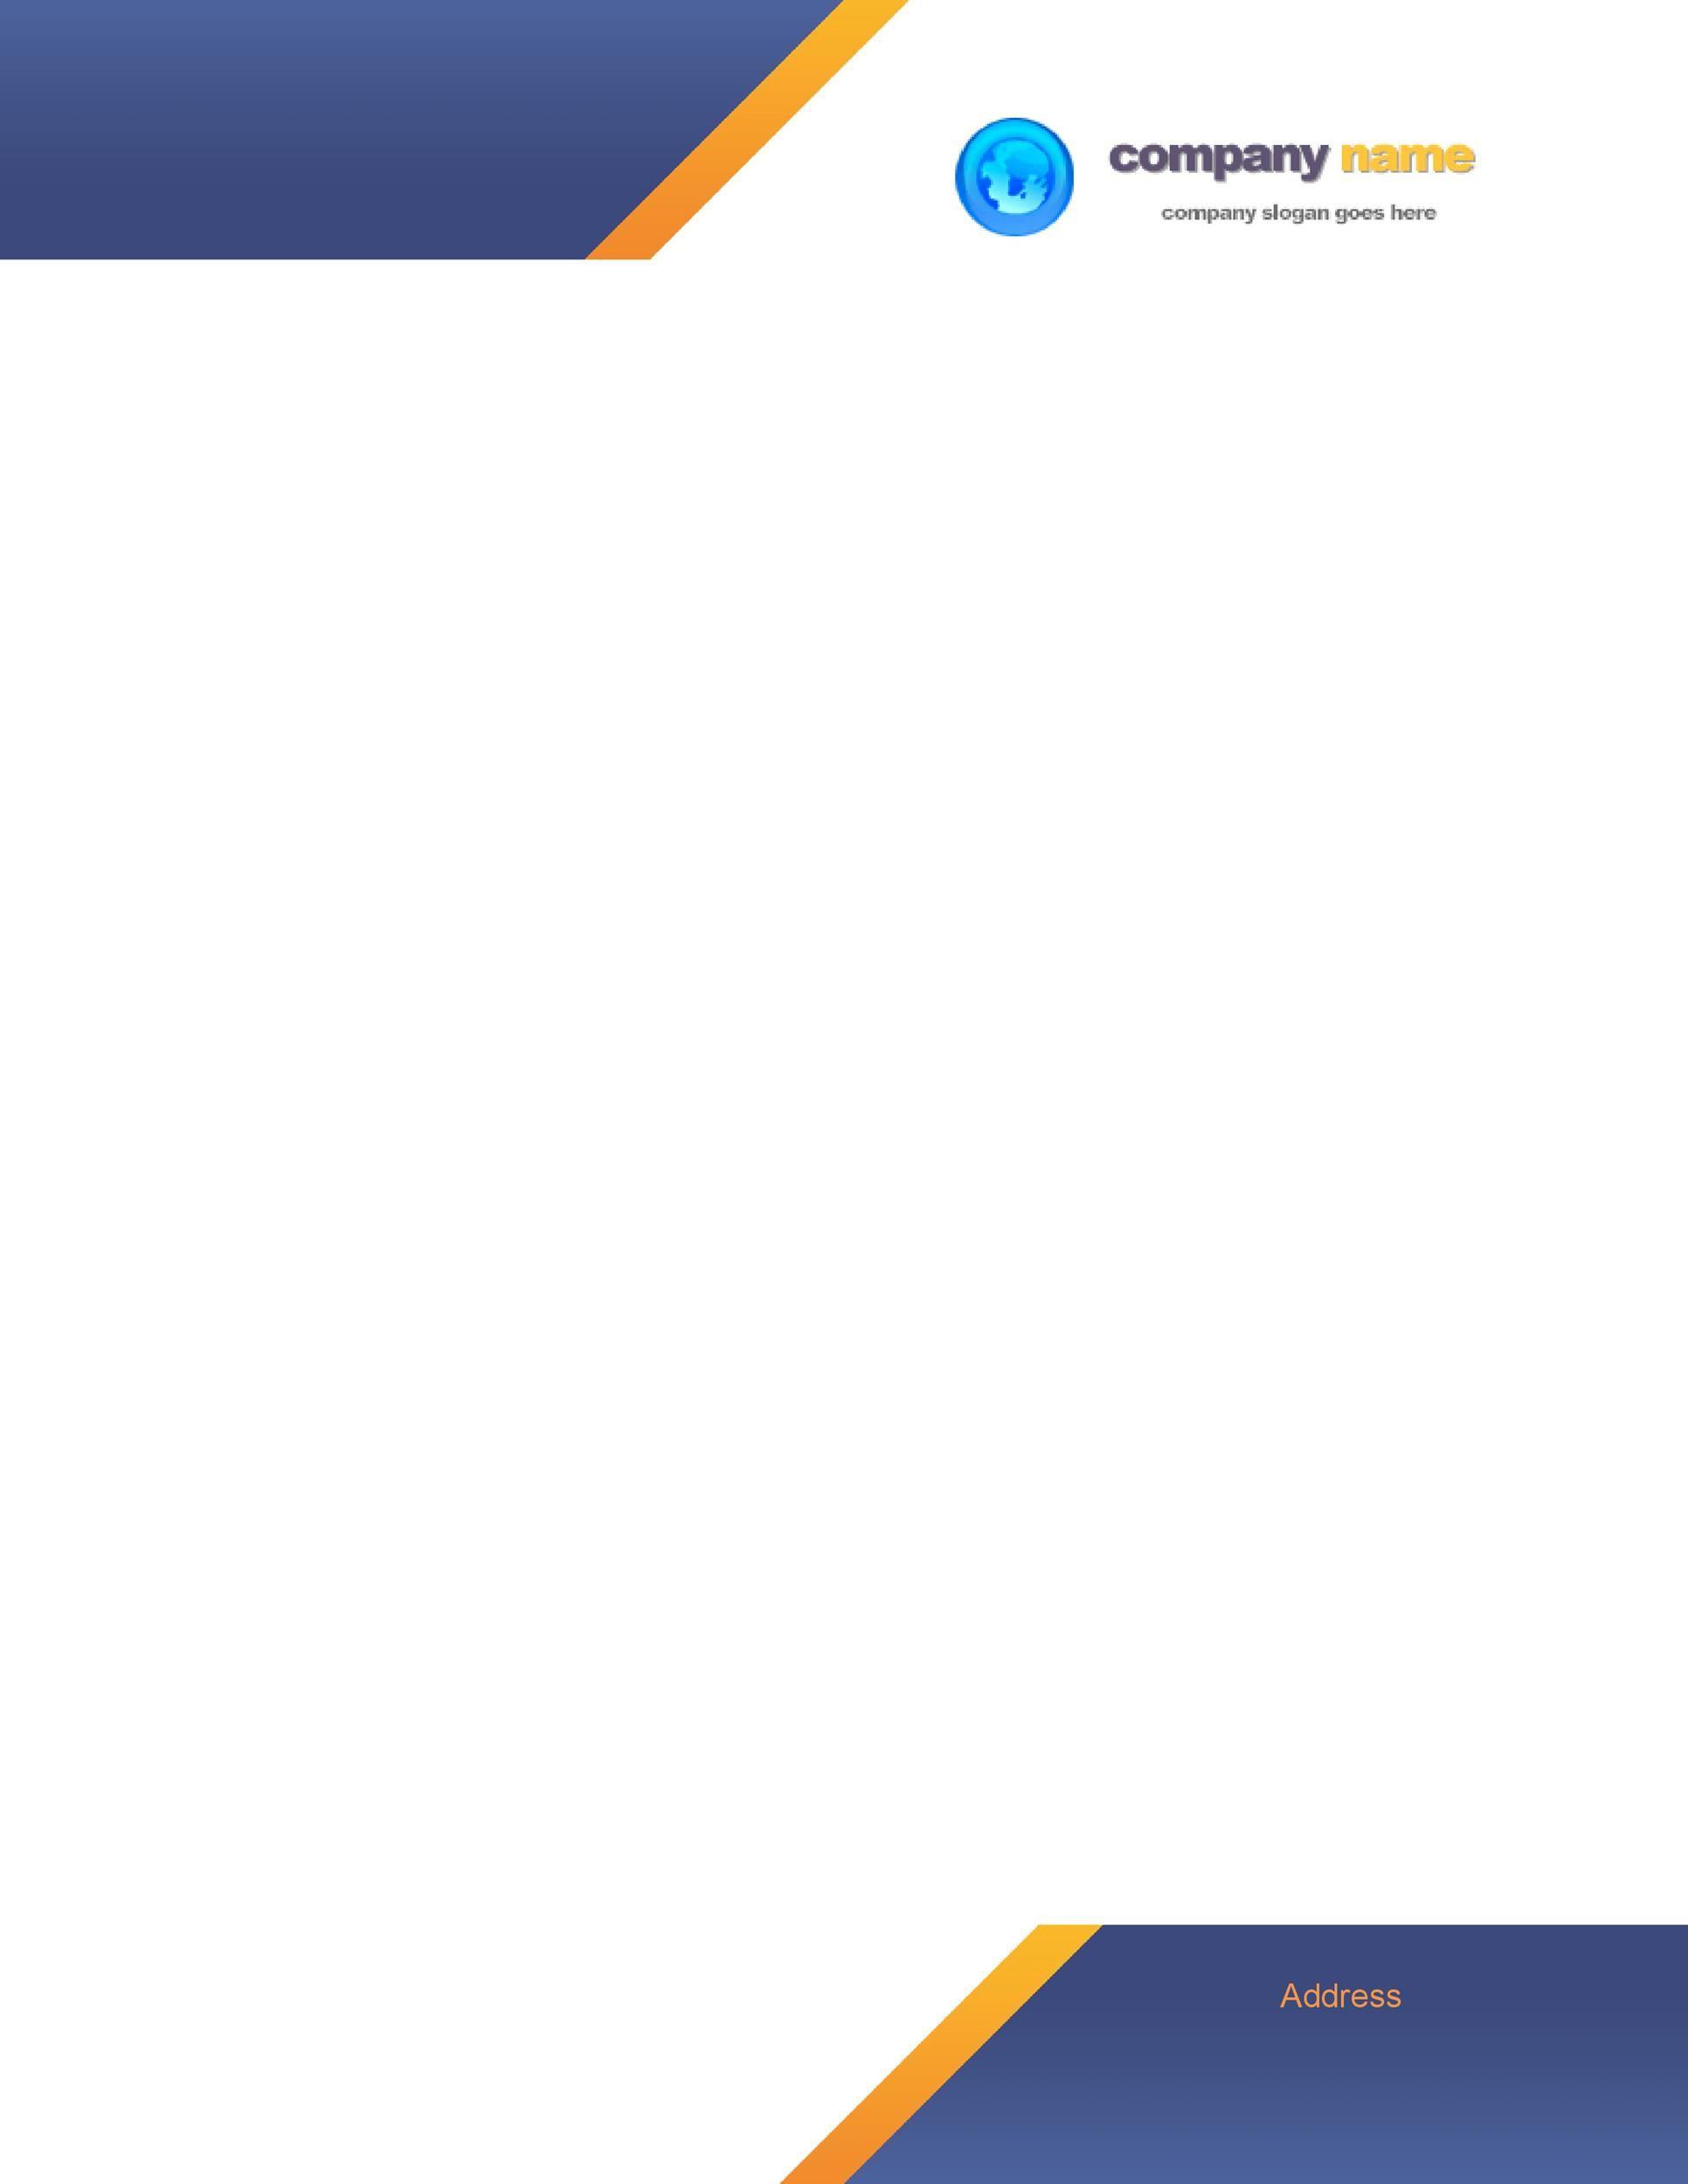 007 Stupendou Stationery Template For Word Sample  Free ChristmaFull